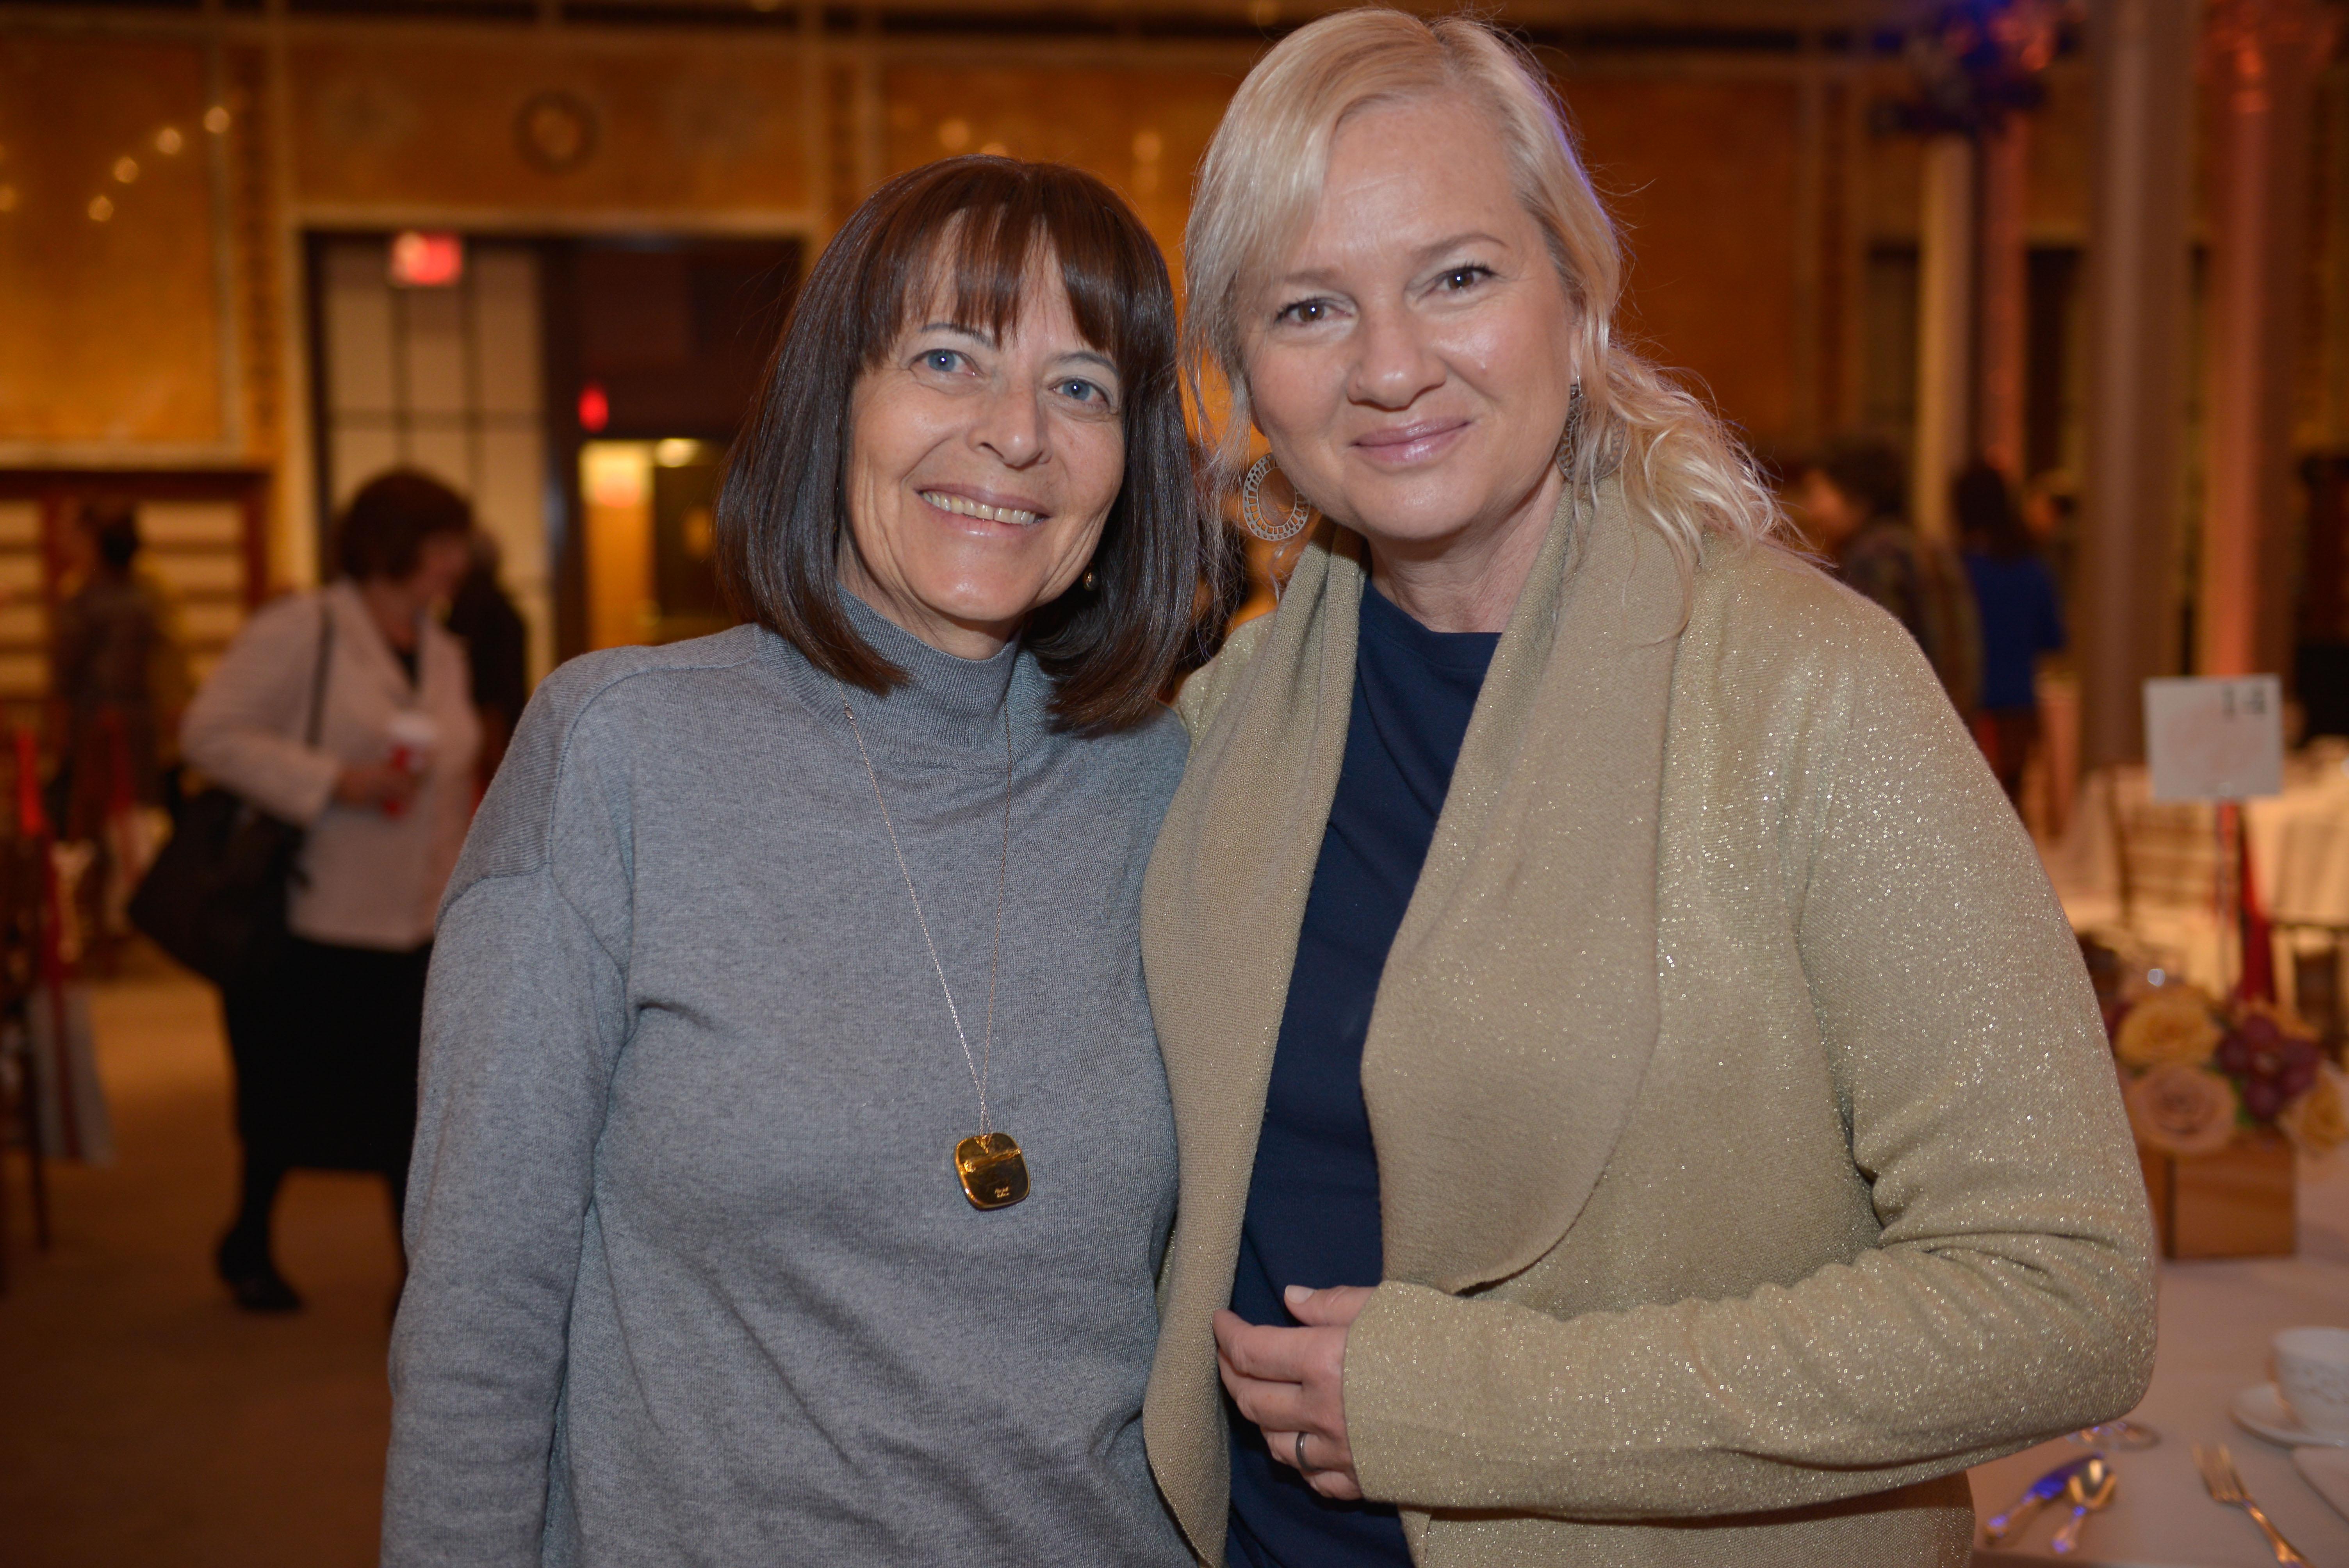 From left: 2015 Covenant Award recipient Sandra Lilienthal and 2012 Covenant Award recipient Karina Zilberman.